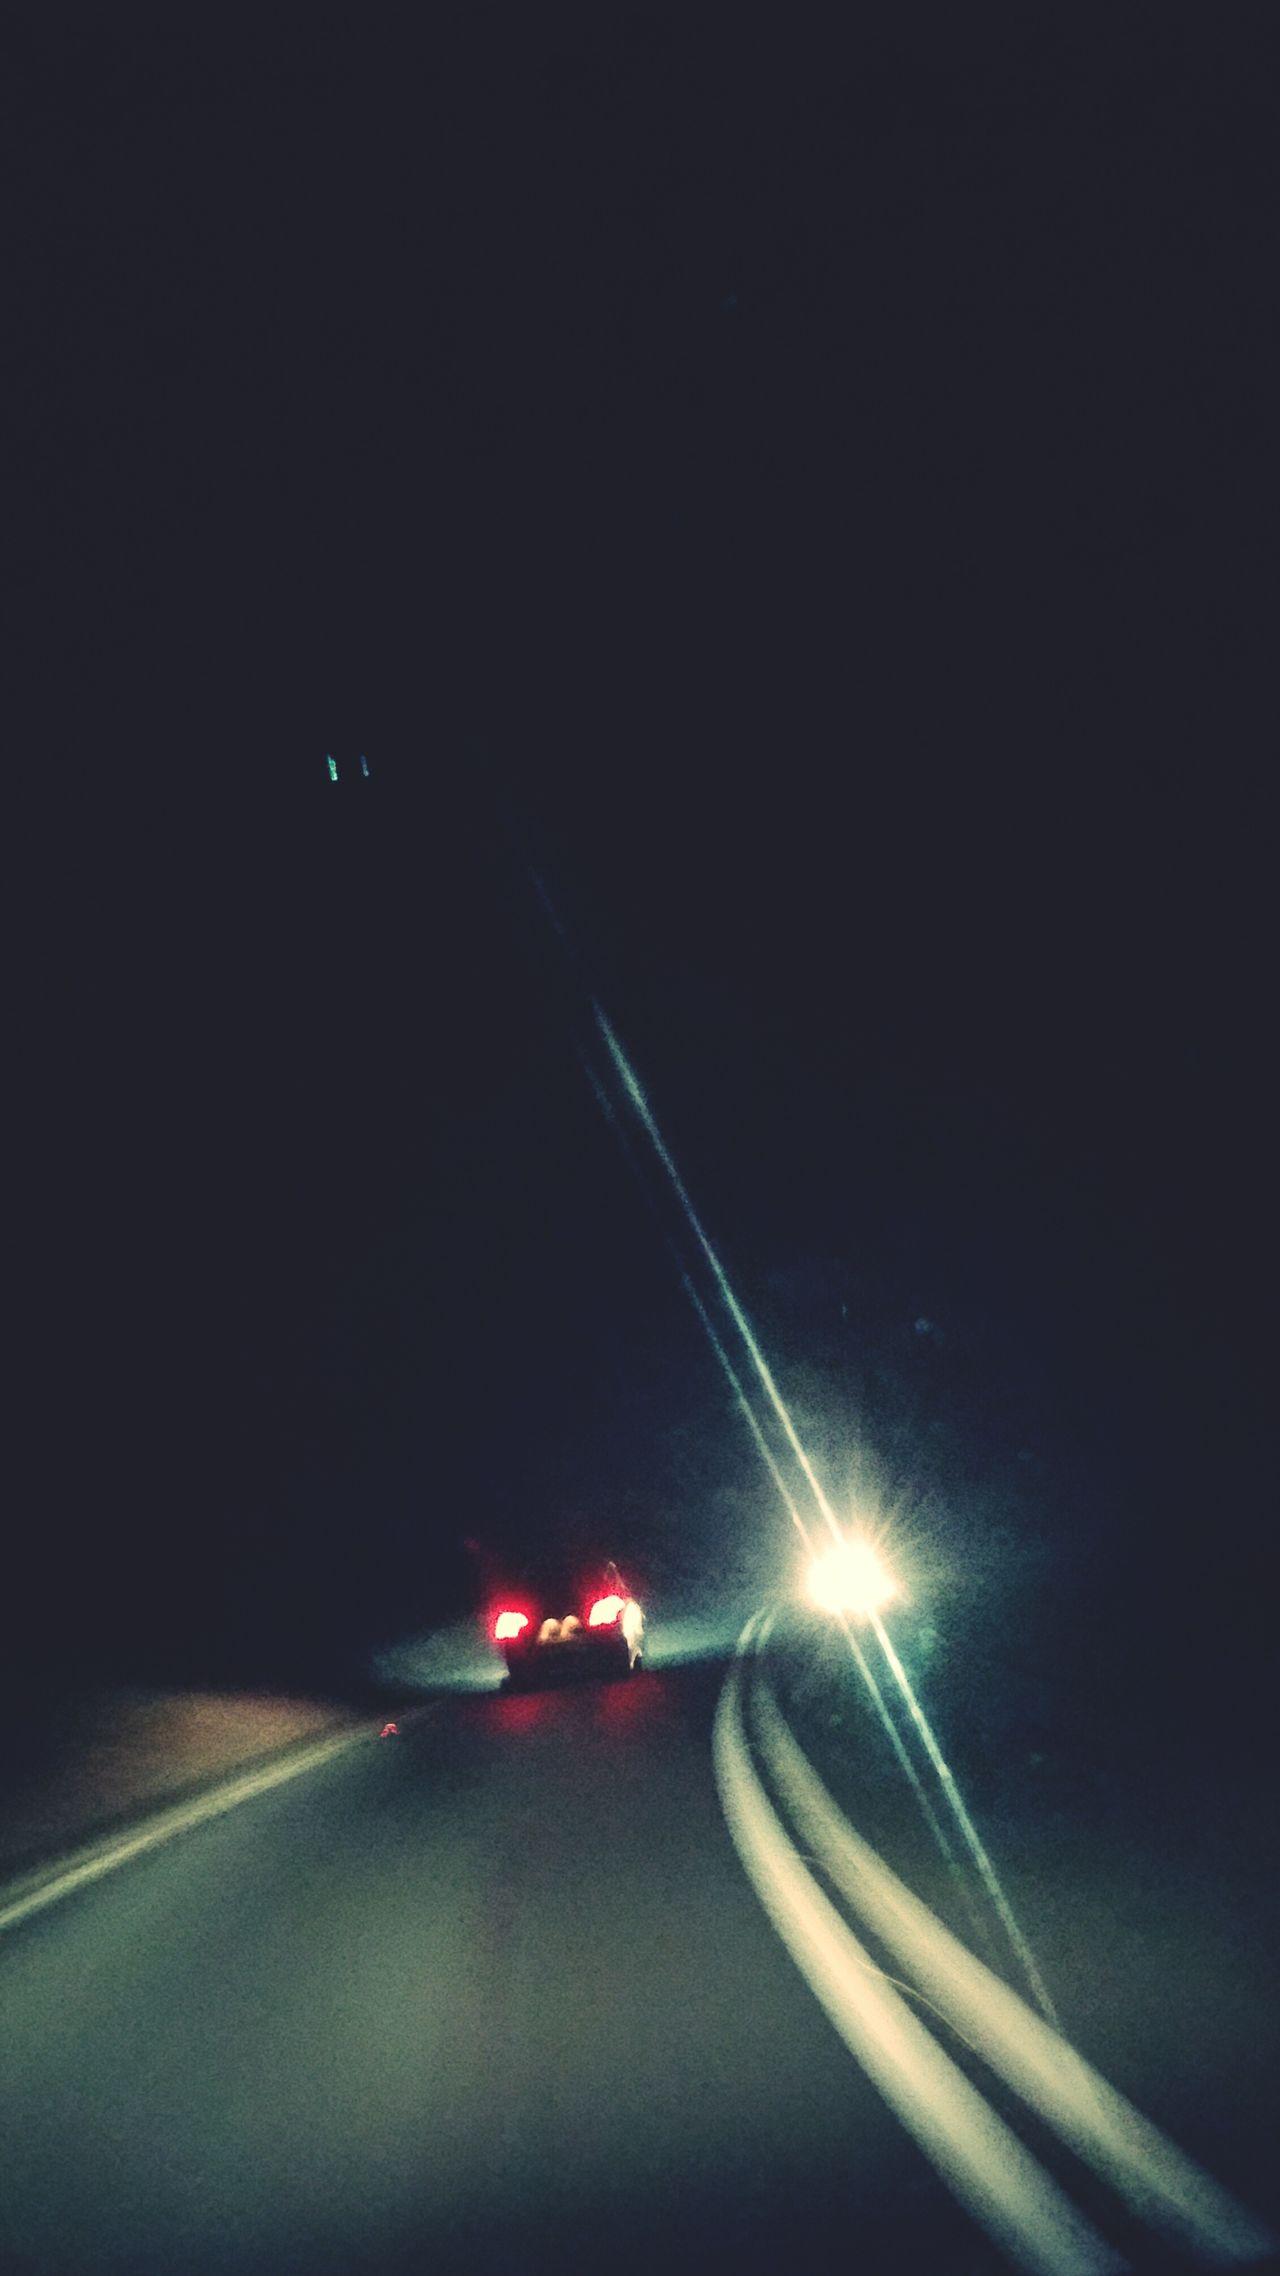 Nightphotography Nightdriving View From My Dash